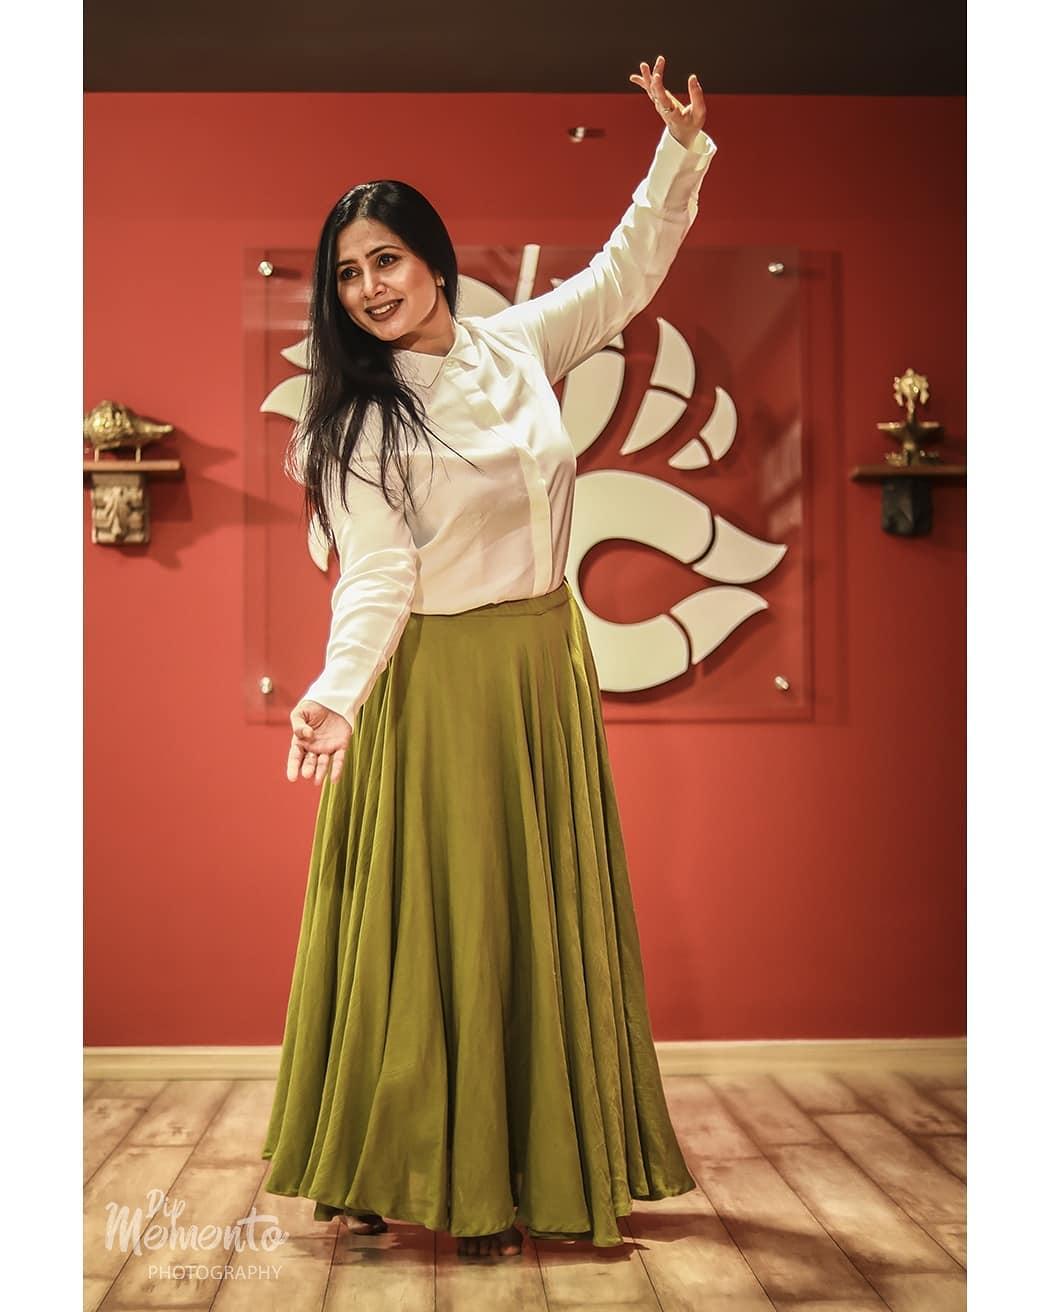 #Dance enables you to find yourself and lose yourself at the same time.... . . Dance Shoot for  @nrityalayabyjashodapatel @jashodapatel_kathak 📸@dip_memento_photography . .  #kathakdancers #indiandancecrew #bollywooddance #dancersofindia  #kathak #kathakdance #classicaldance #ahmedabad #indianclassicaldance #dancephotography #chakkars #happydancing #classicaldance #indiandancer #dancersofinstagram #indianclassicaldance  #kathakdance #kathakdancer #indianclassicaldancers #9924227745 #dipmementophotography  #worldofdance #dance #indiandanceform #loveforkathak #dancers #dancersindia #indiaportraits